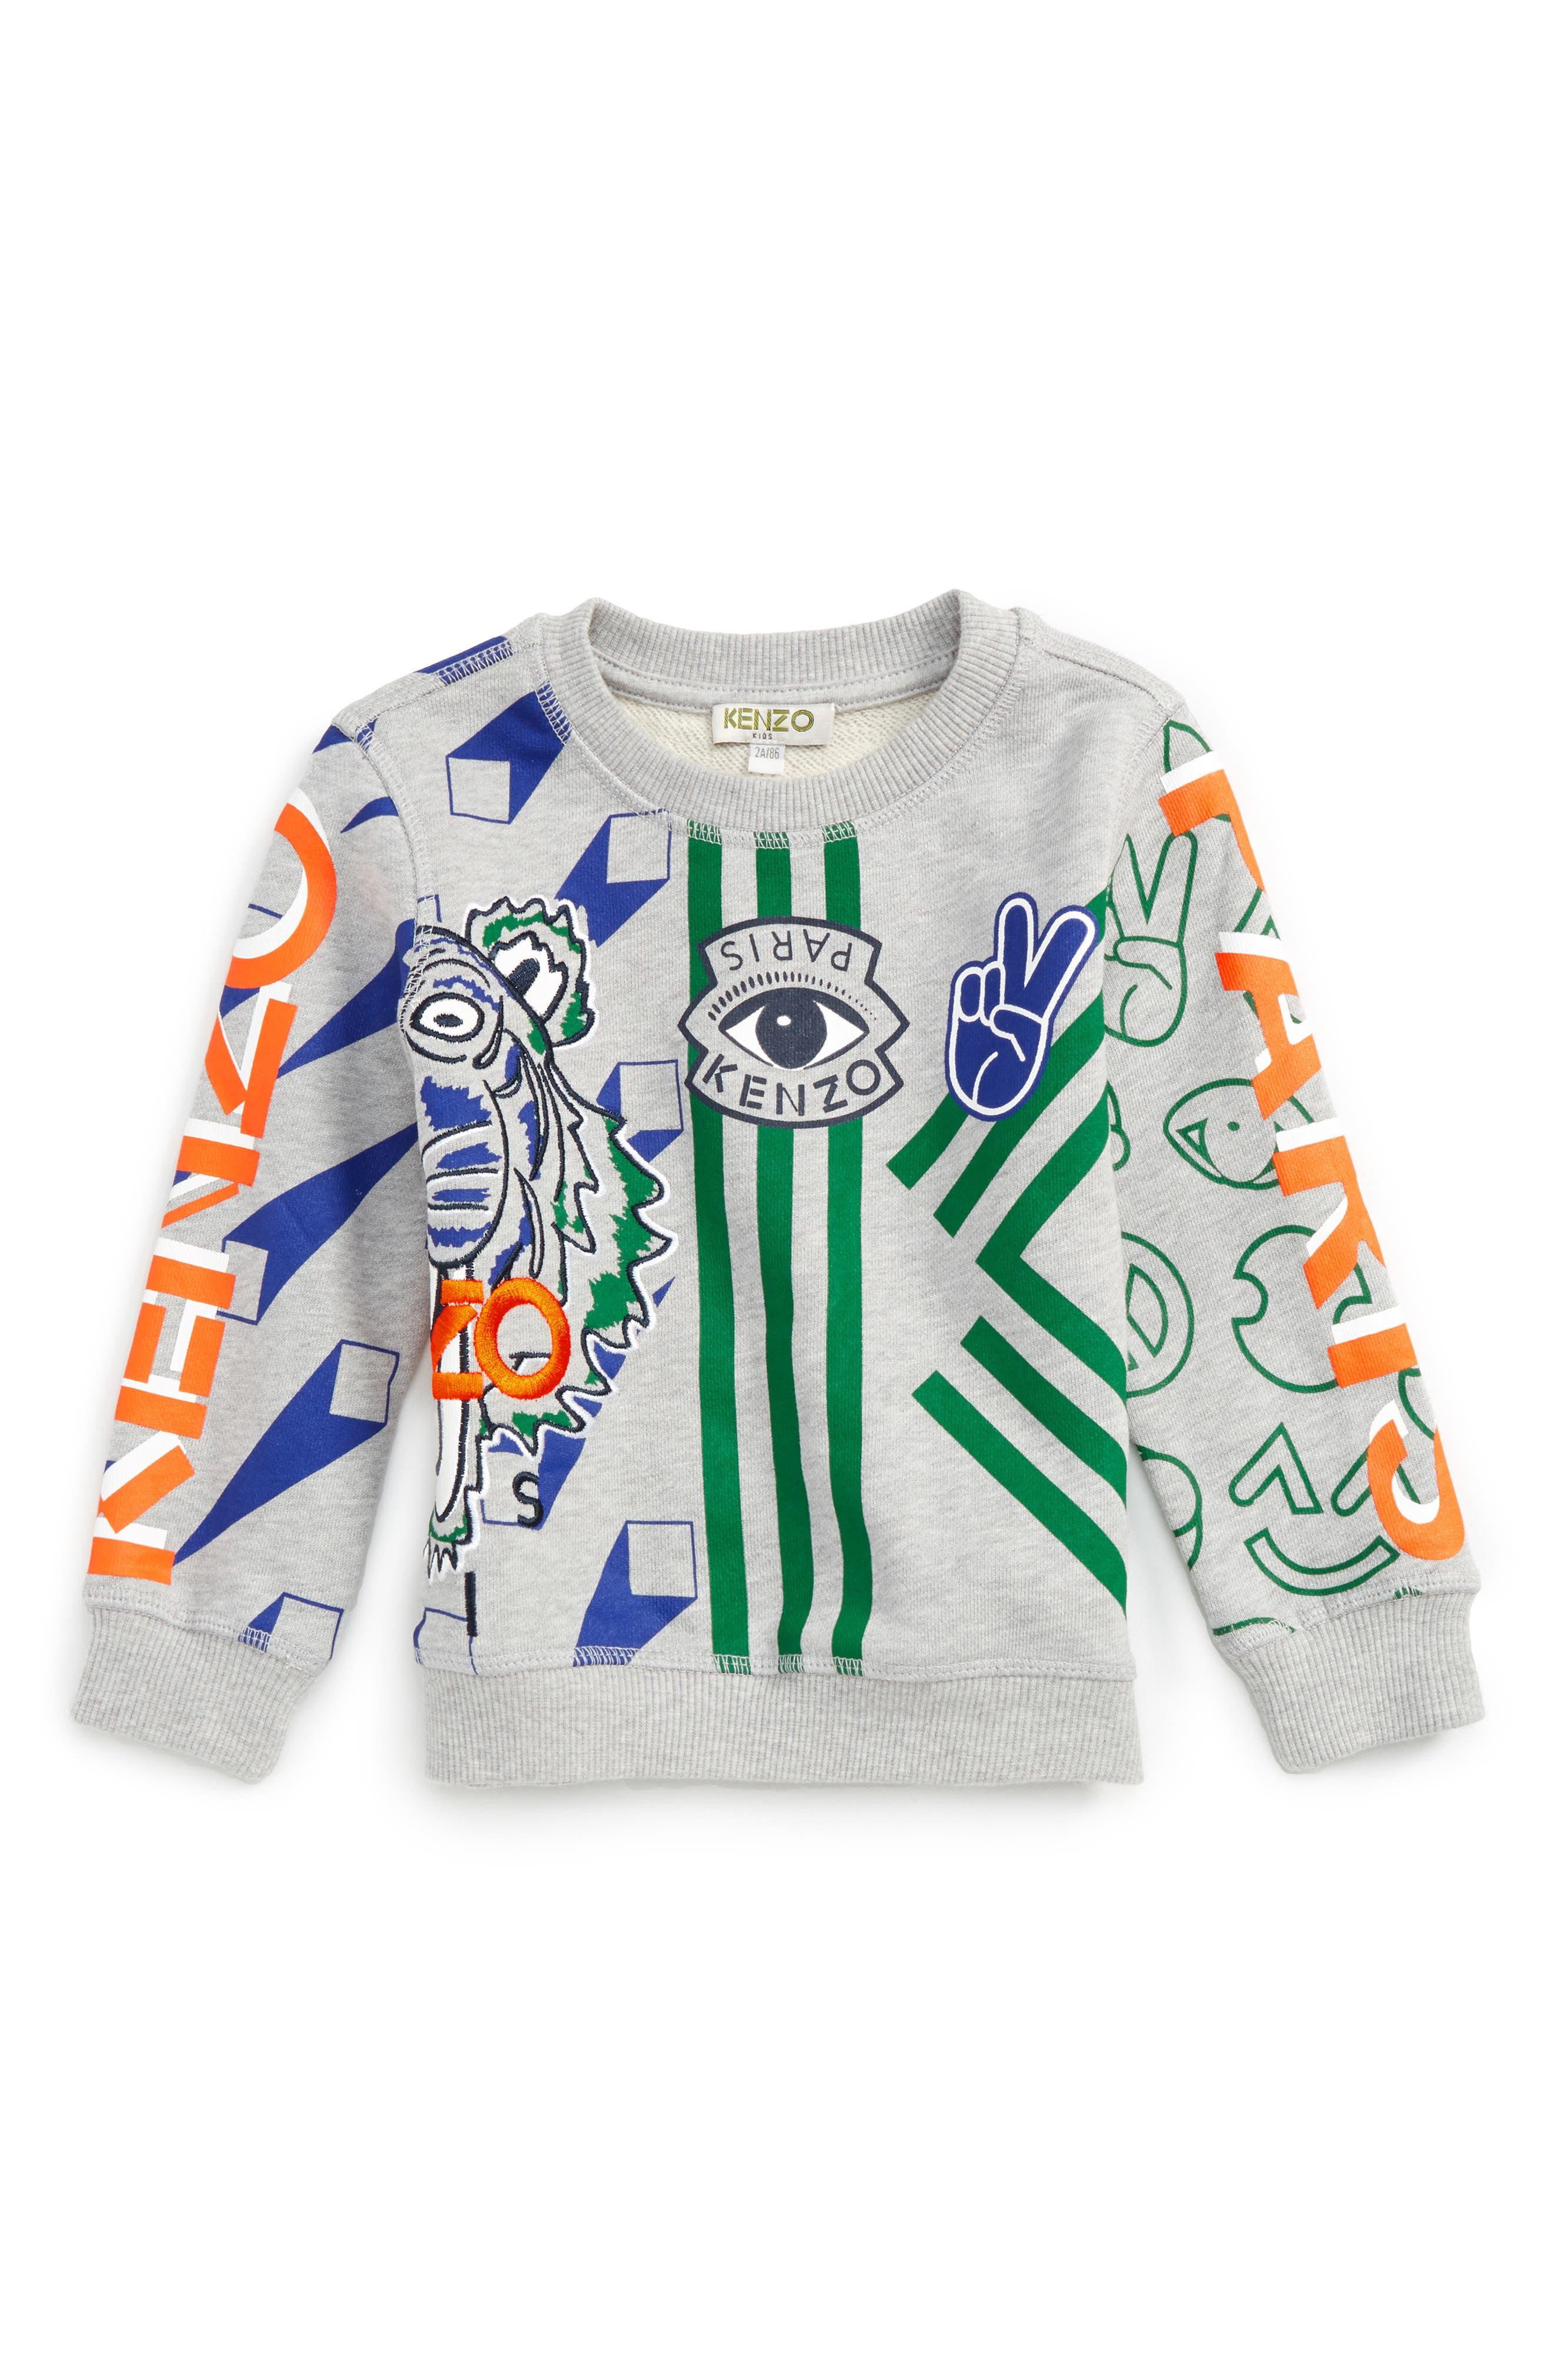 Main Image - KENZO Tiger Sweatshirt (Toddler Boys, Little Boys & Big Boys)